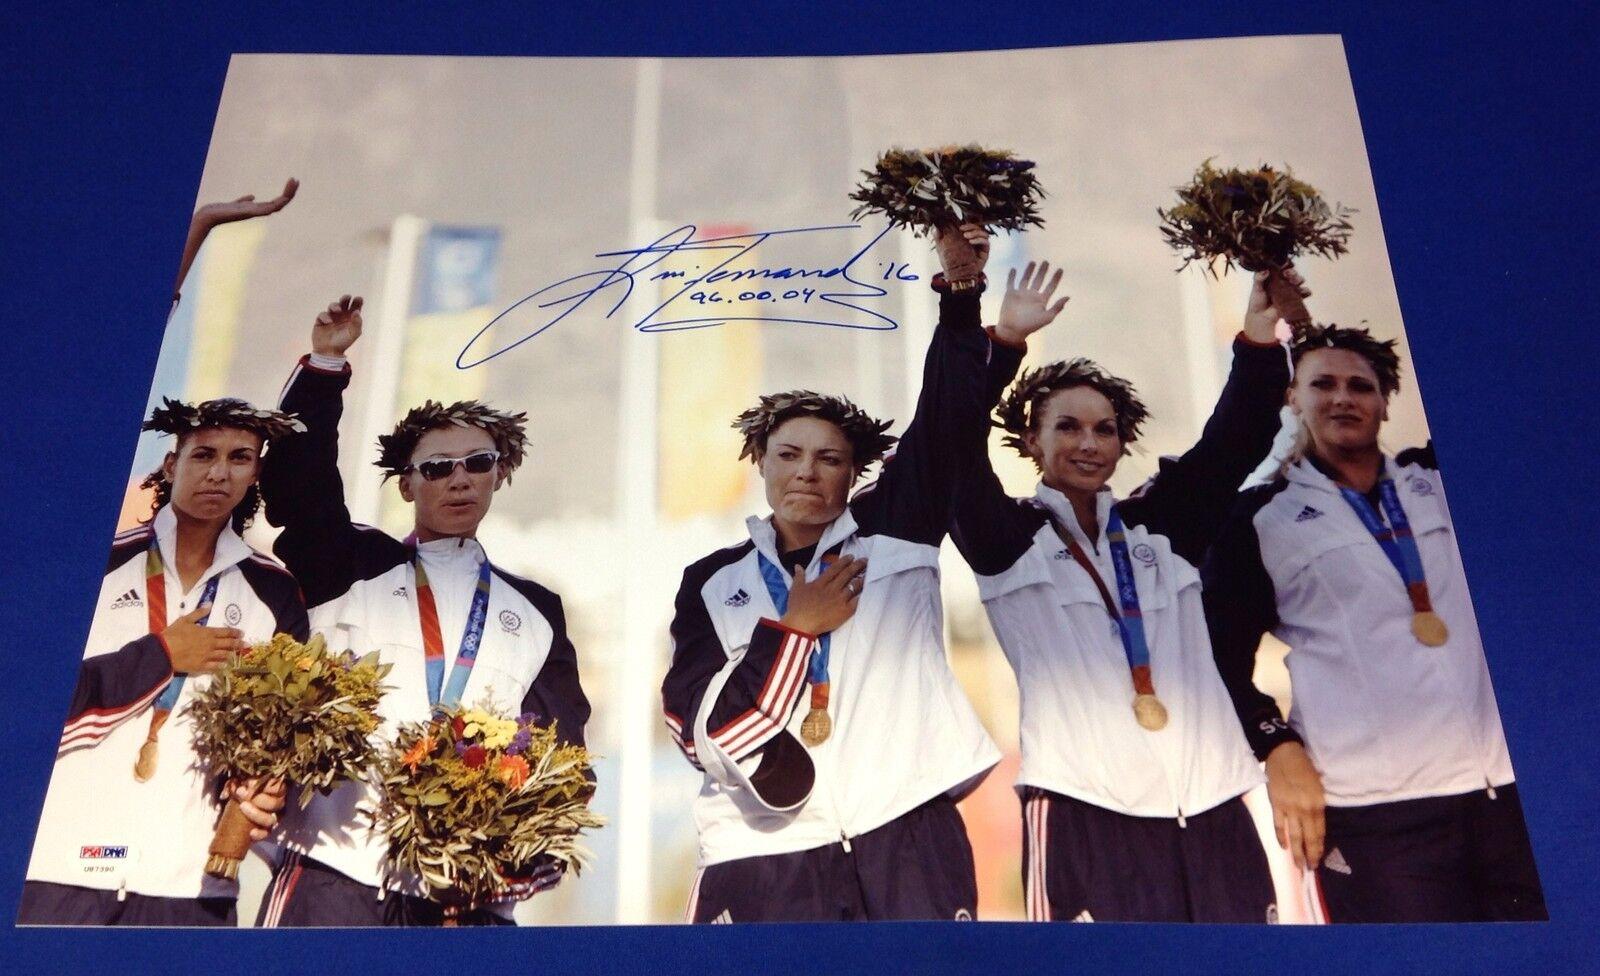 Lisa Fernandez Women Olympic Softball Team 16x20 Photo PSA/DNA #U87390